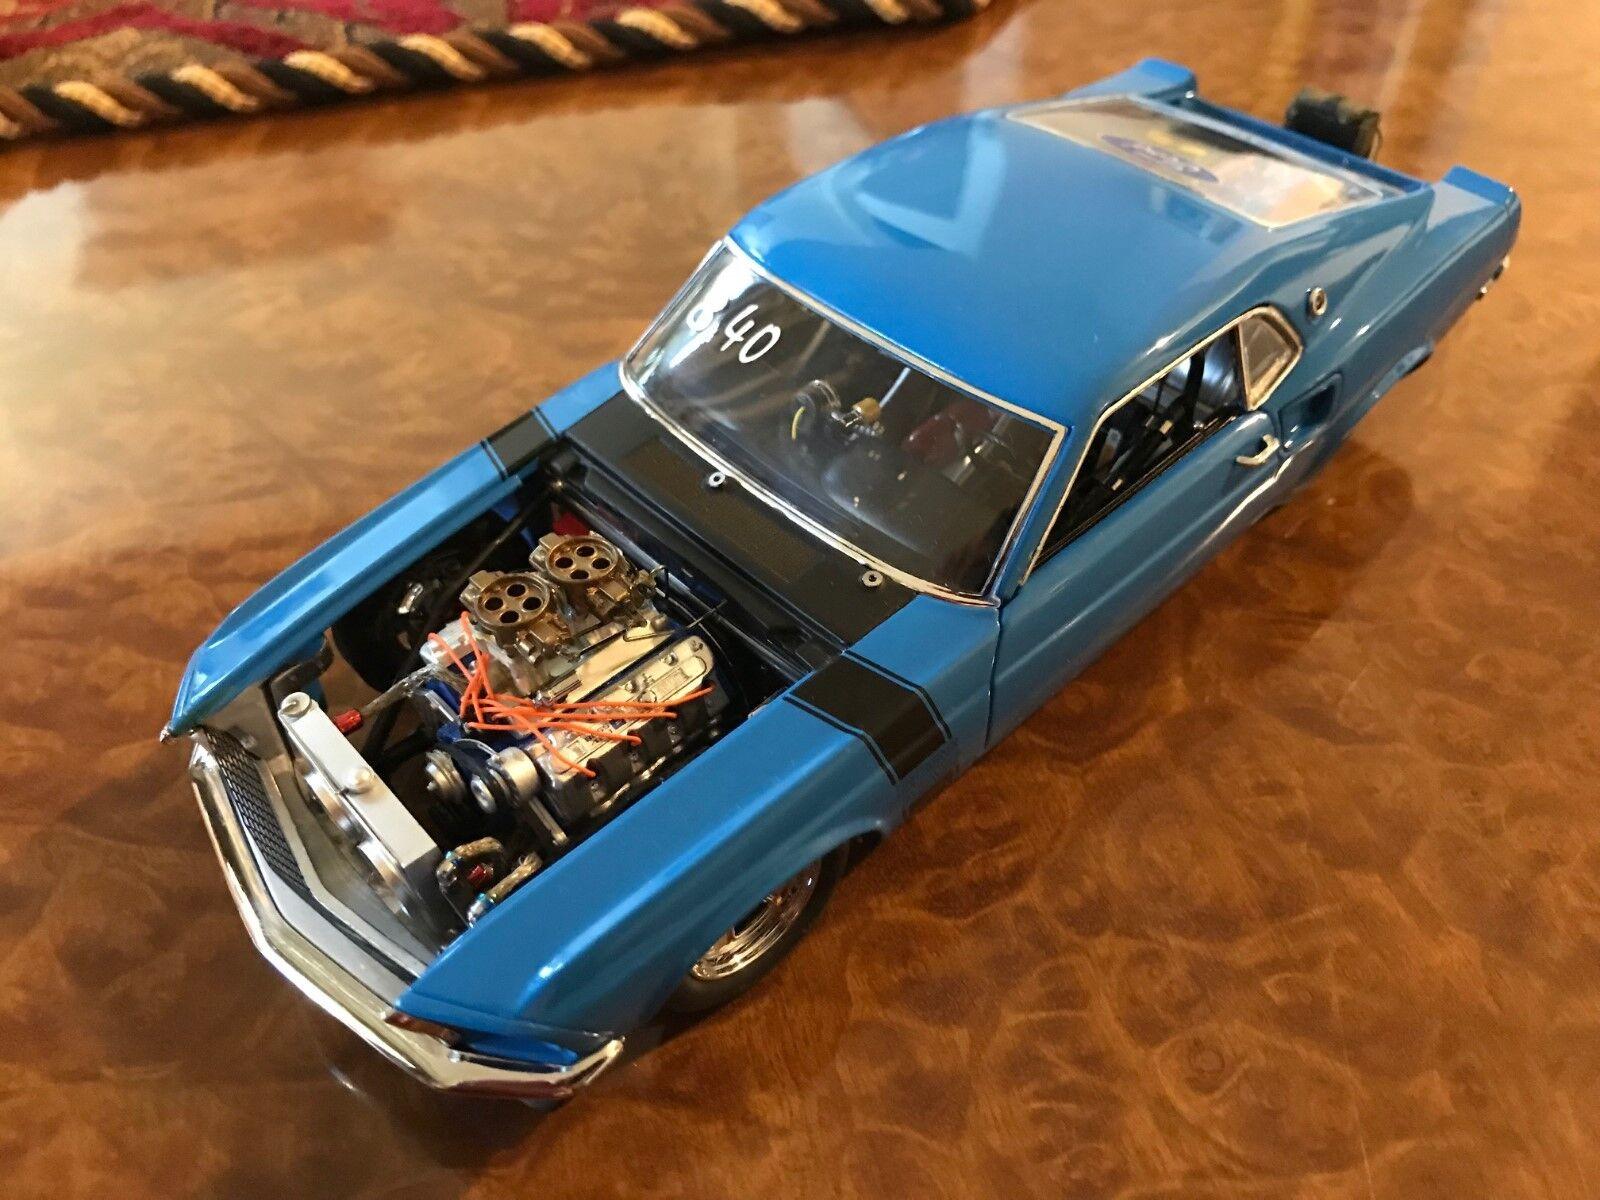 Danbury Mint Tout Nouveau 1 24 1969 Ford Mustang Boss Nine Pro-Street